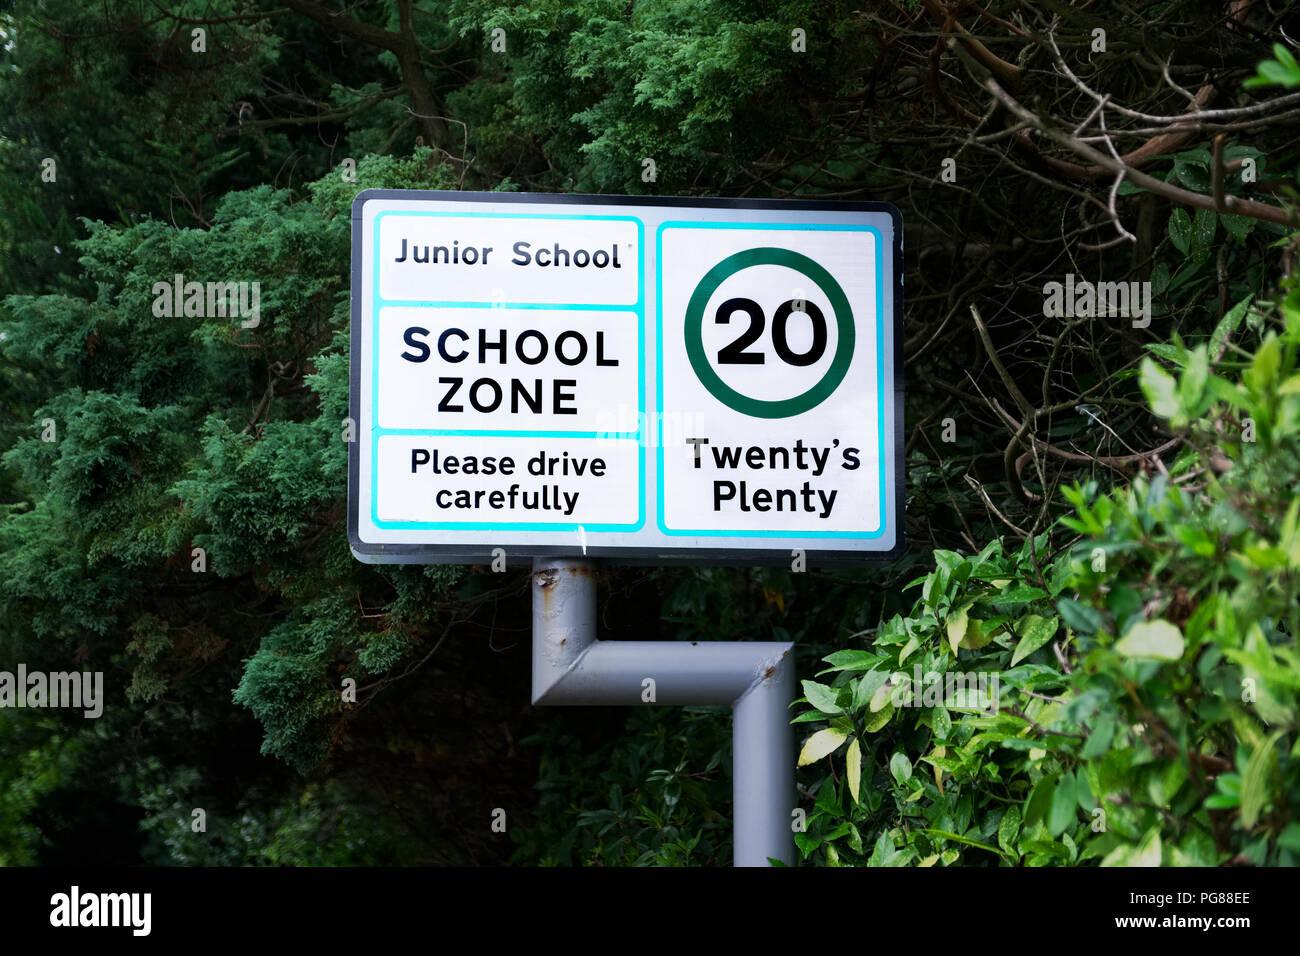 School zone twenty plenty please drive carefully sign - Stock Image